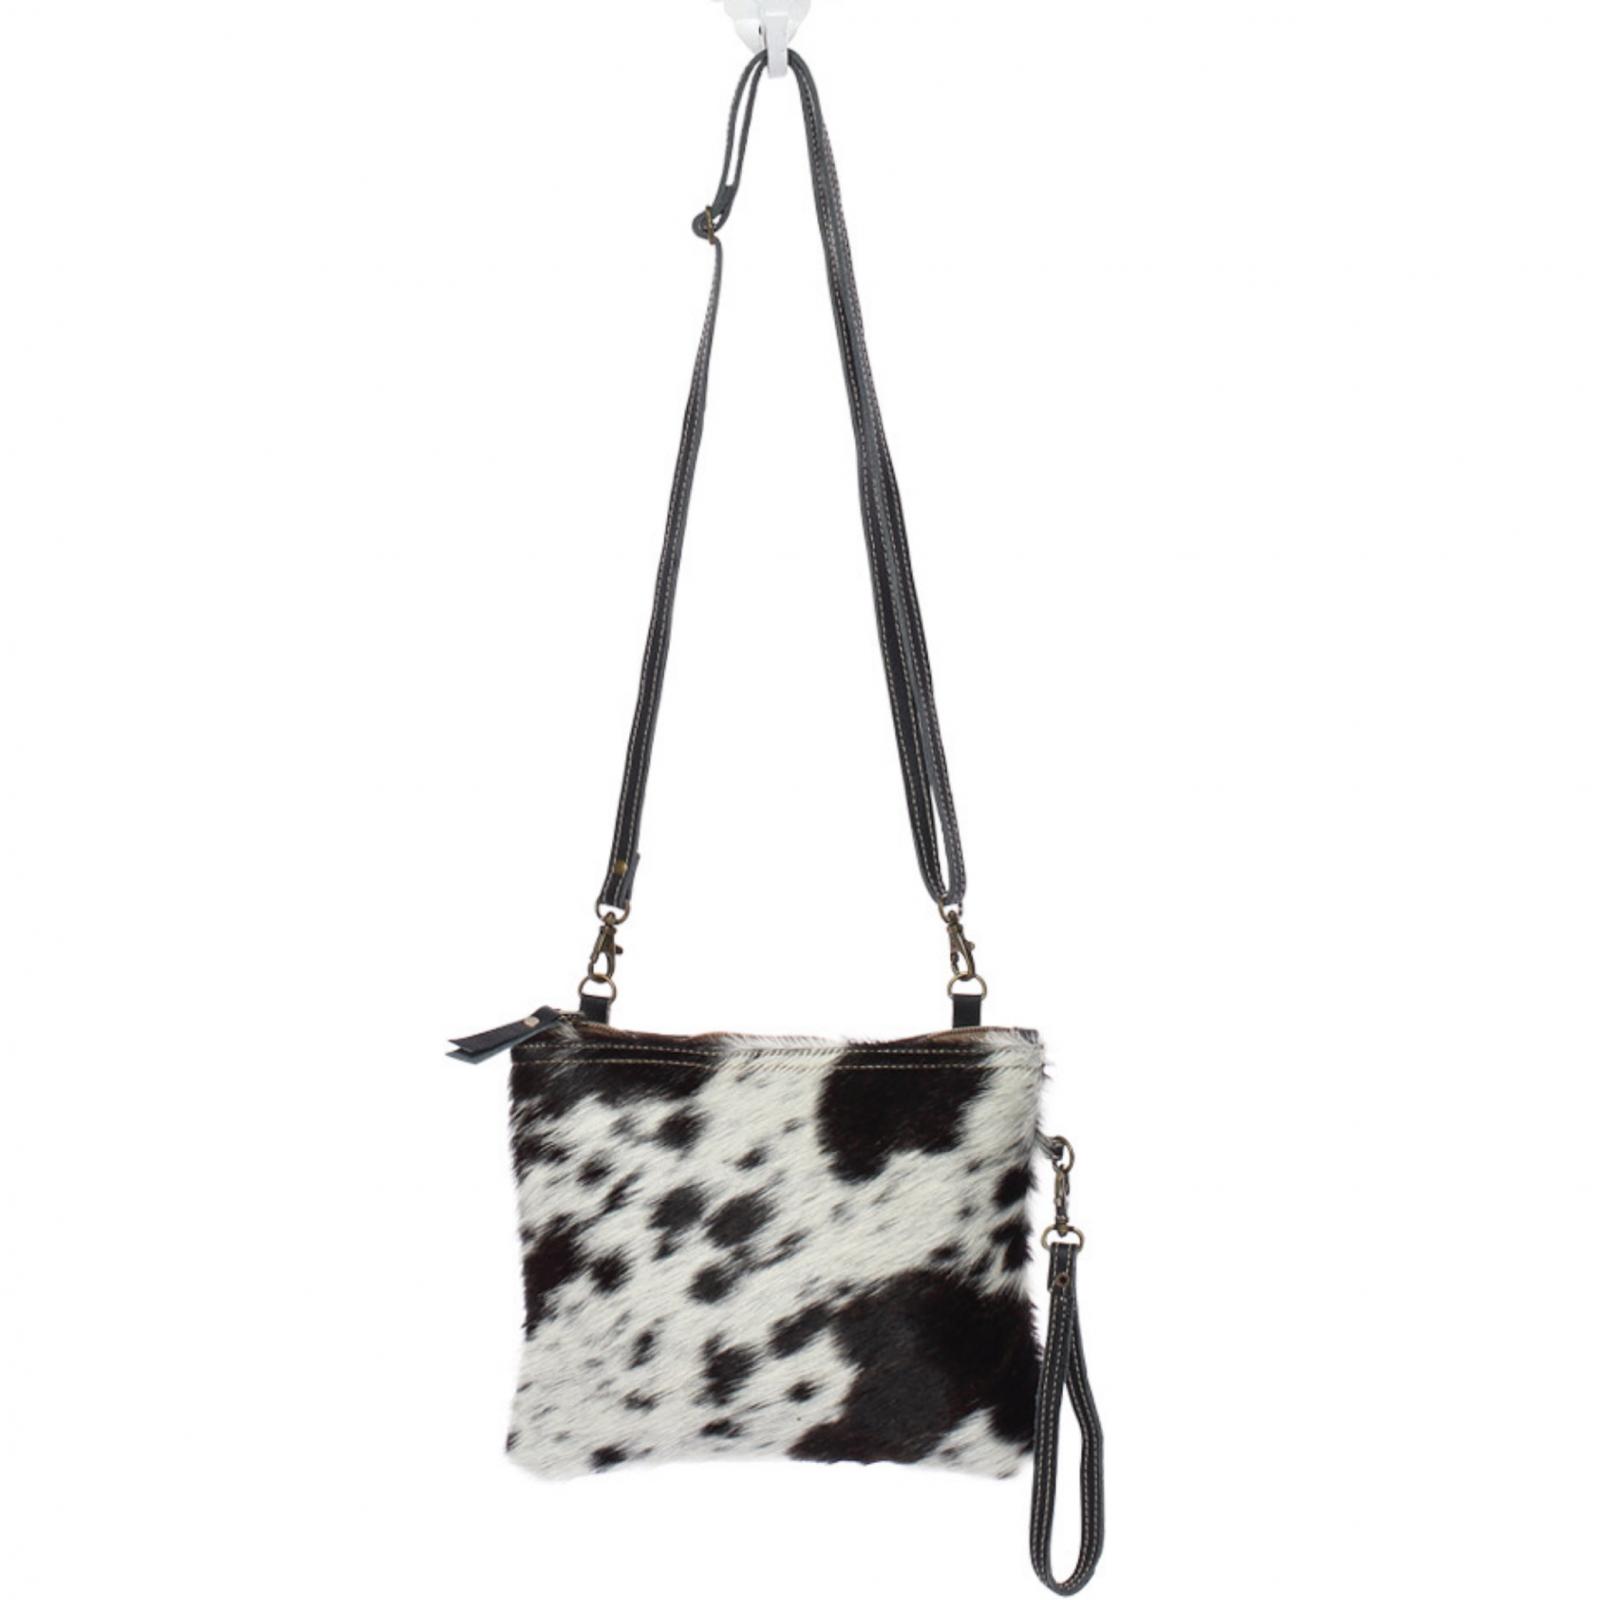 Black & White Shade Bag Crossbody/Wristlet